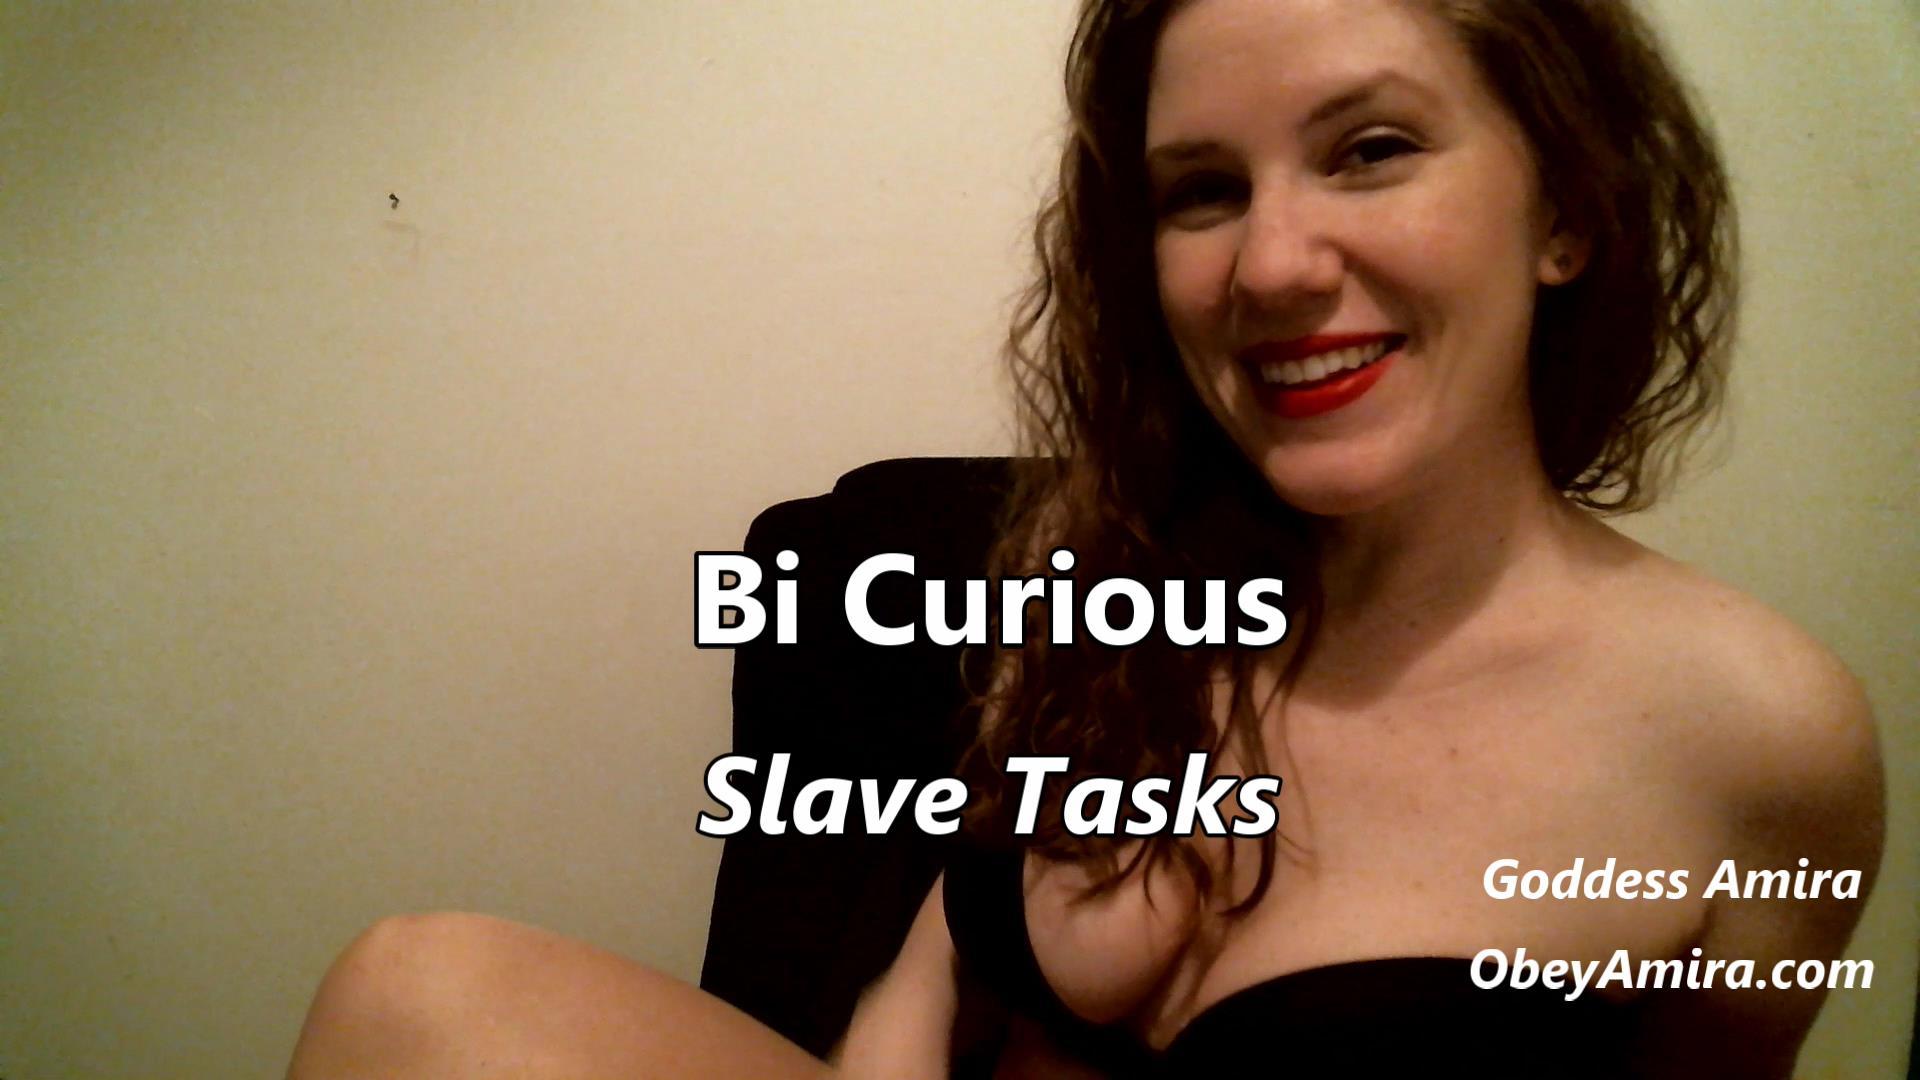 femdom bi gay slave tasks